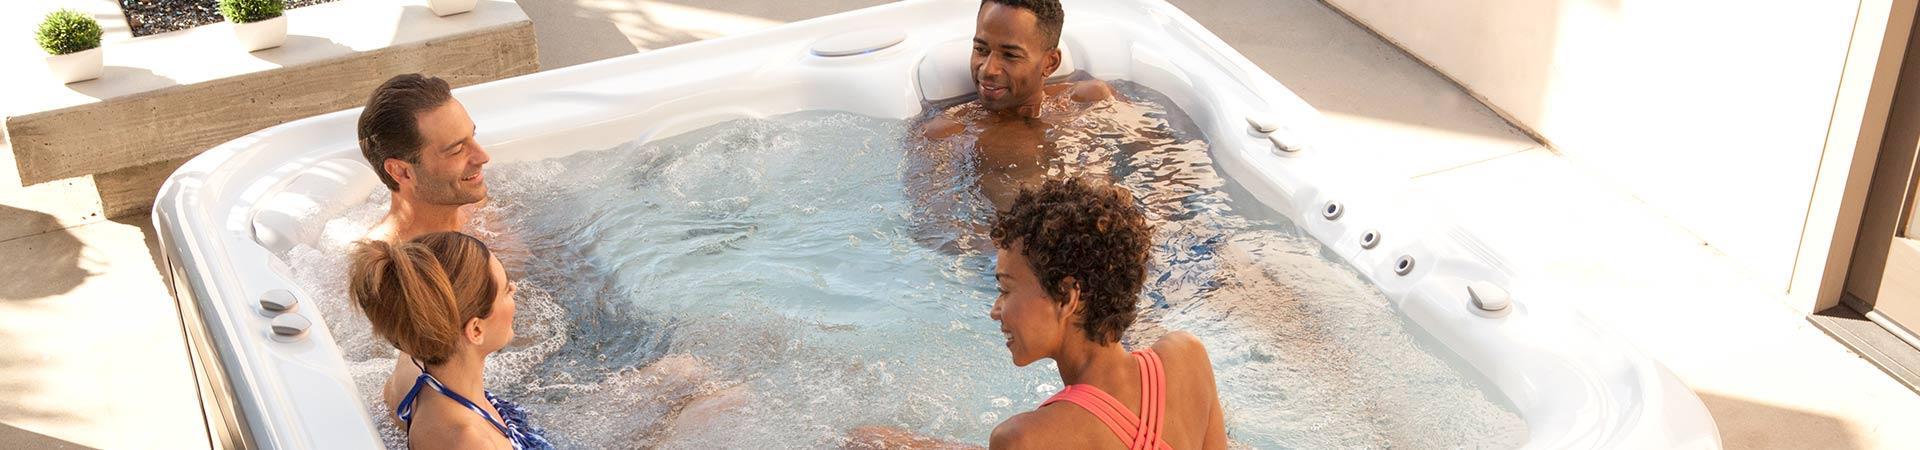 Salt Water Hot Tubs Dealer Des Moines, Participates in Stress Awareness Month